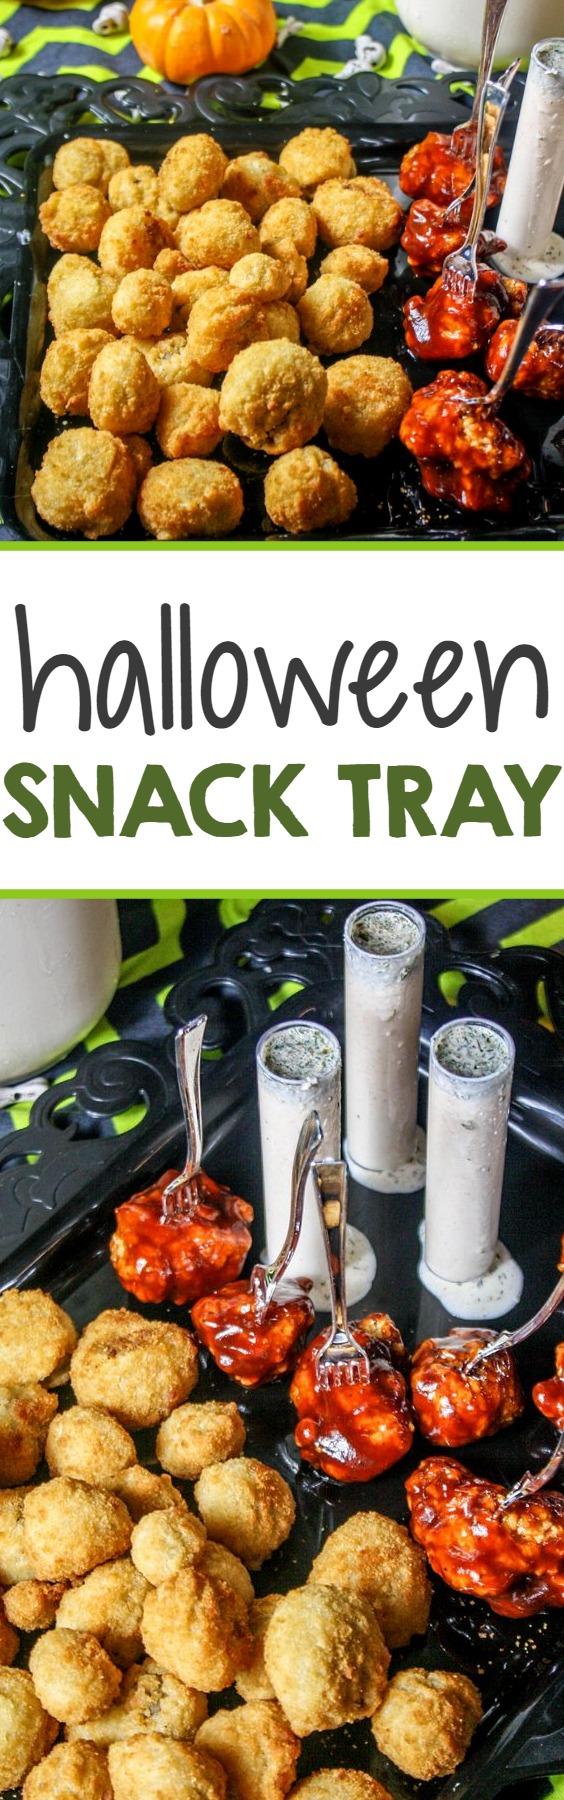 Easy Halloween Snack Tray